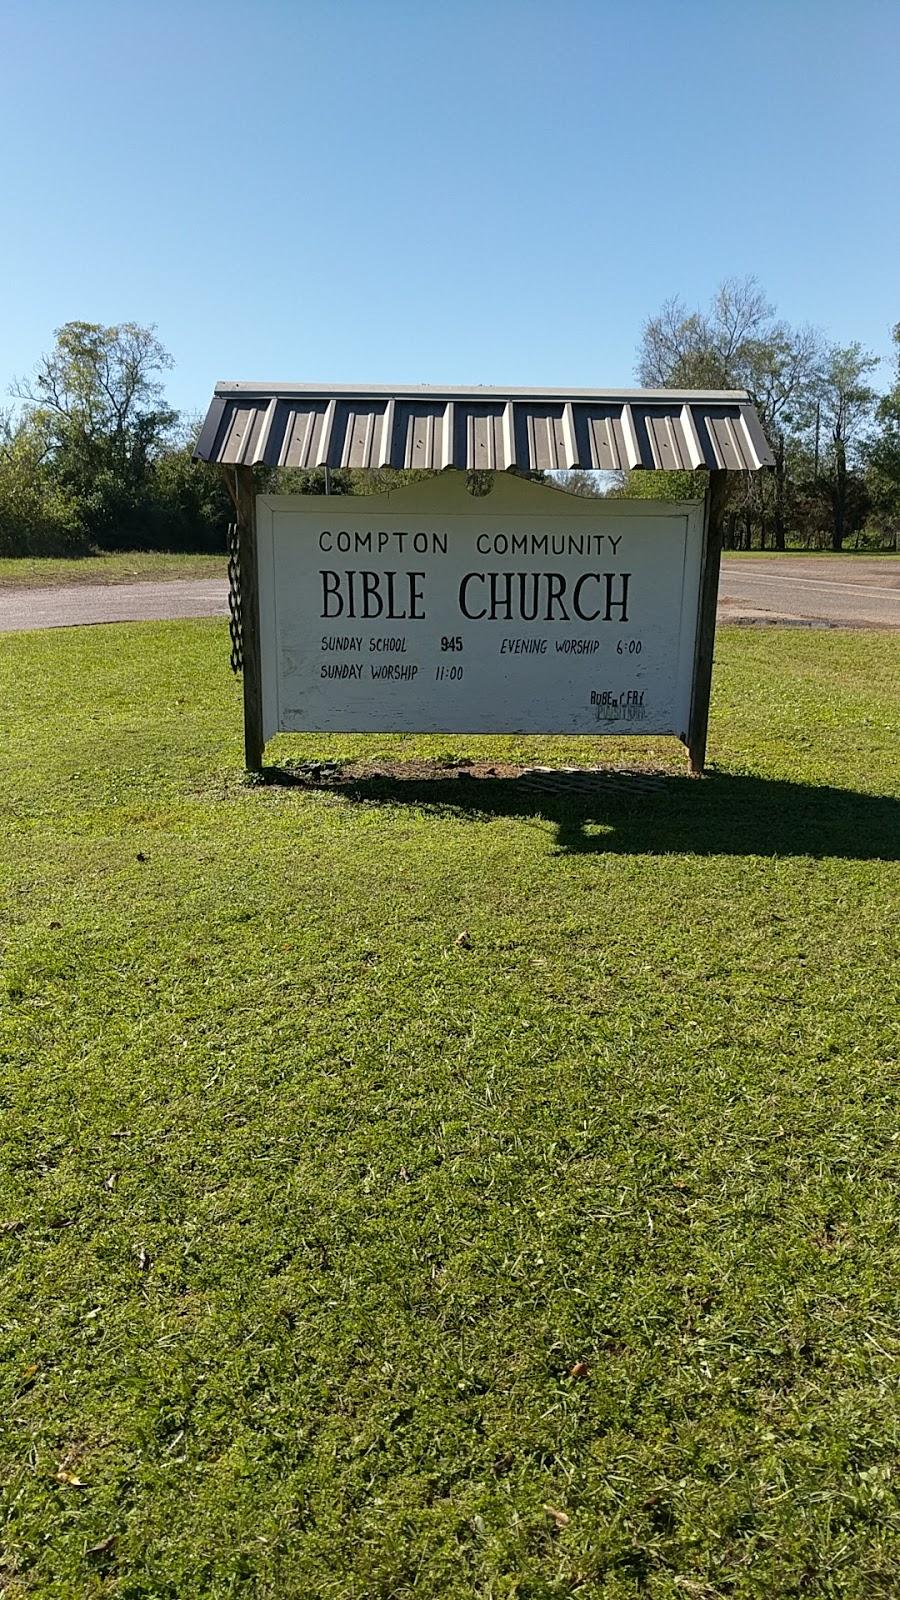 Compton Community Bible Church - church  | Photo 1 of 1 | Address: County Rd 401 S, Henderson, TX 75654, USA | Phone: (936) 222-5602